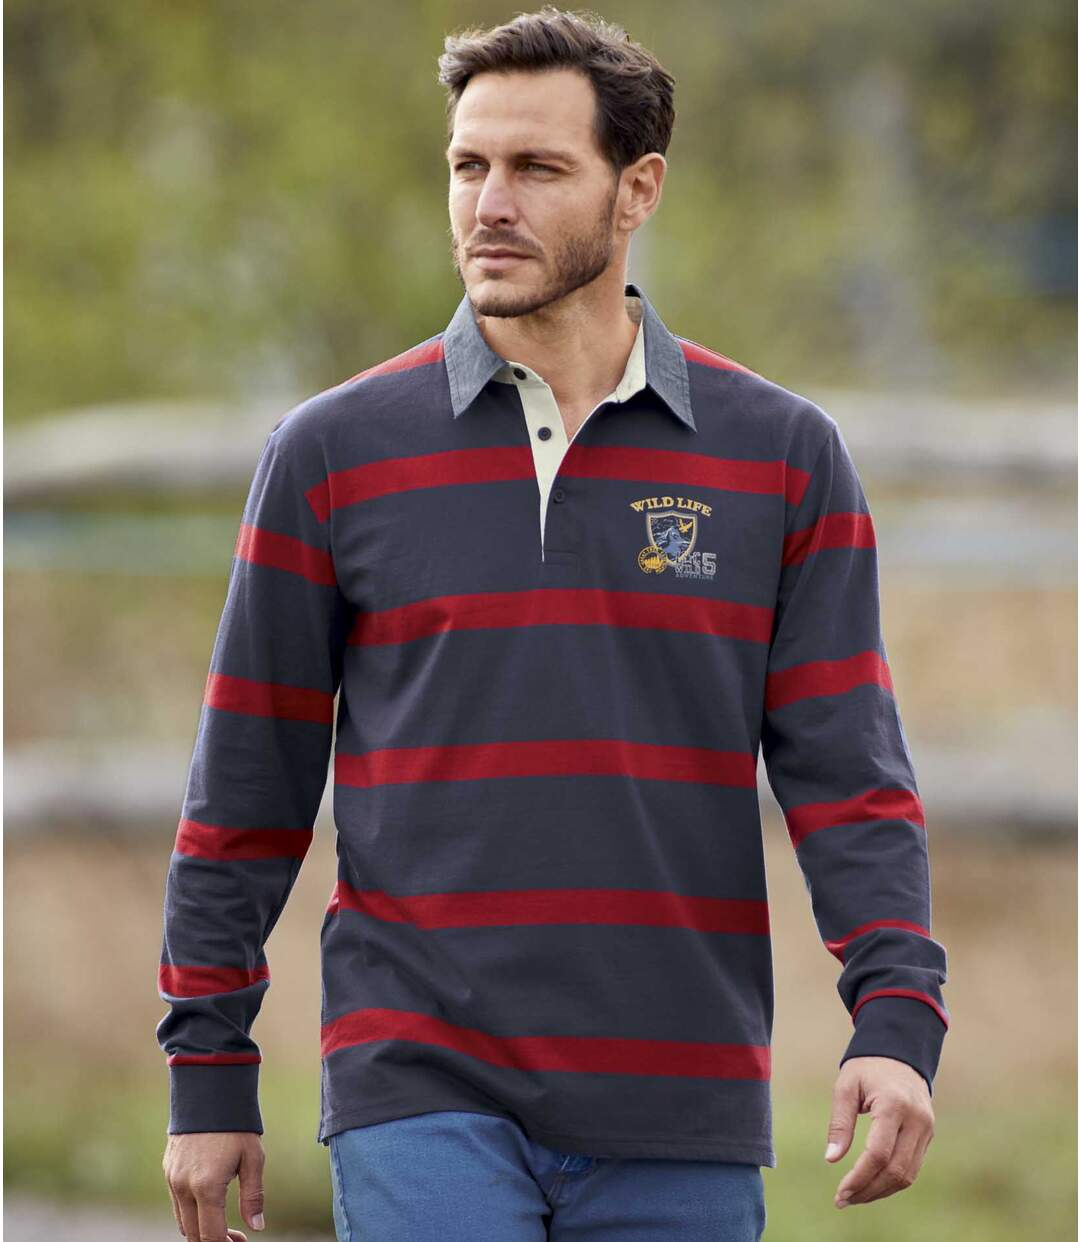 Gestreiftes Poloshirt Savage Lake im Rugby-Stil